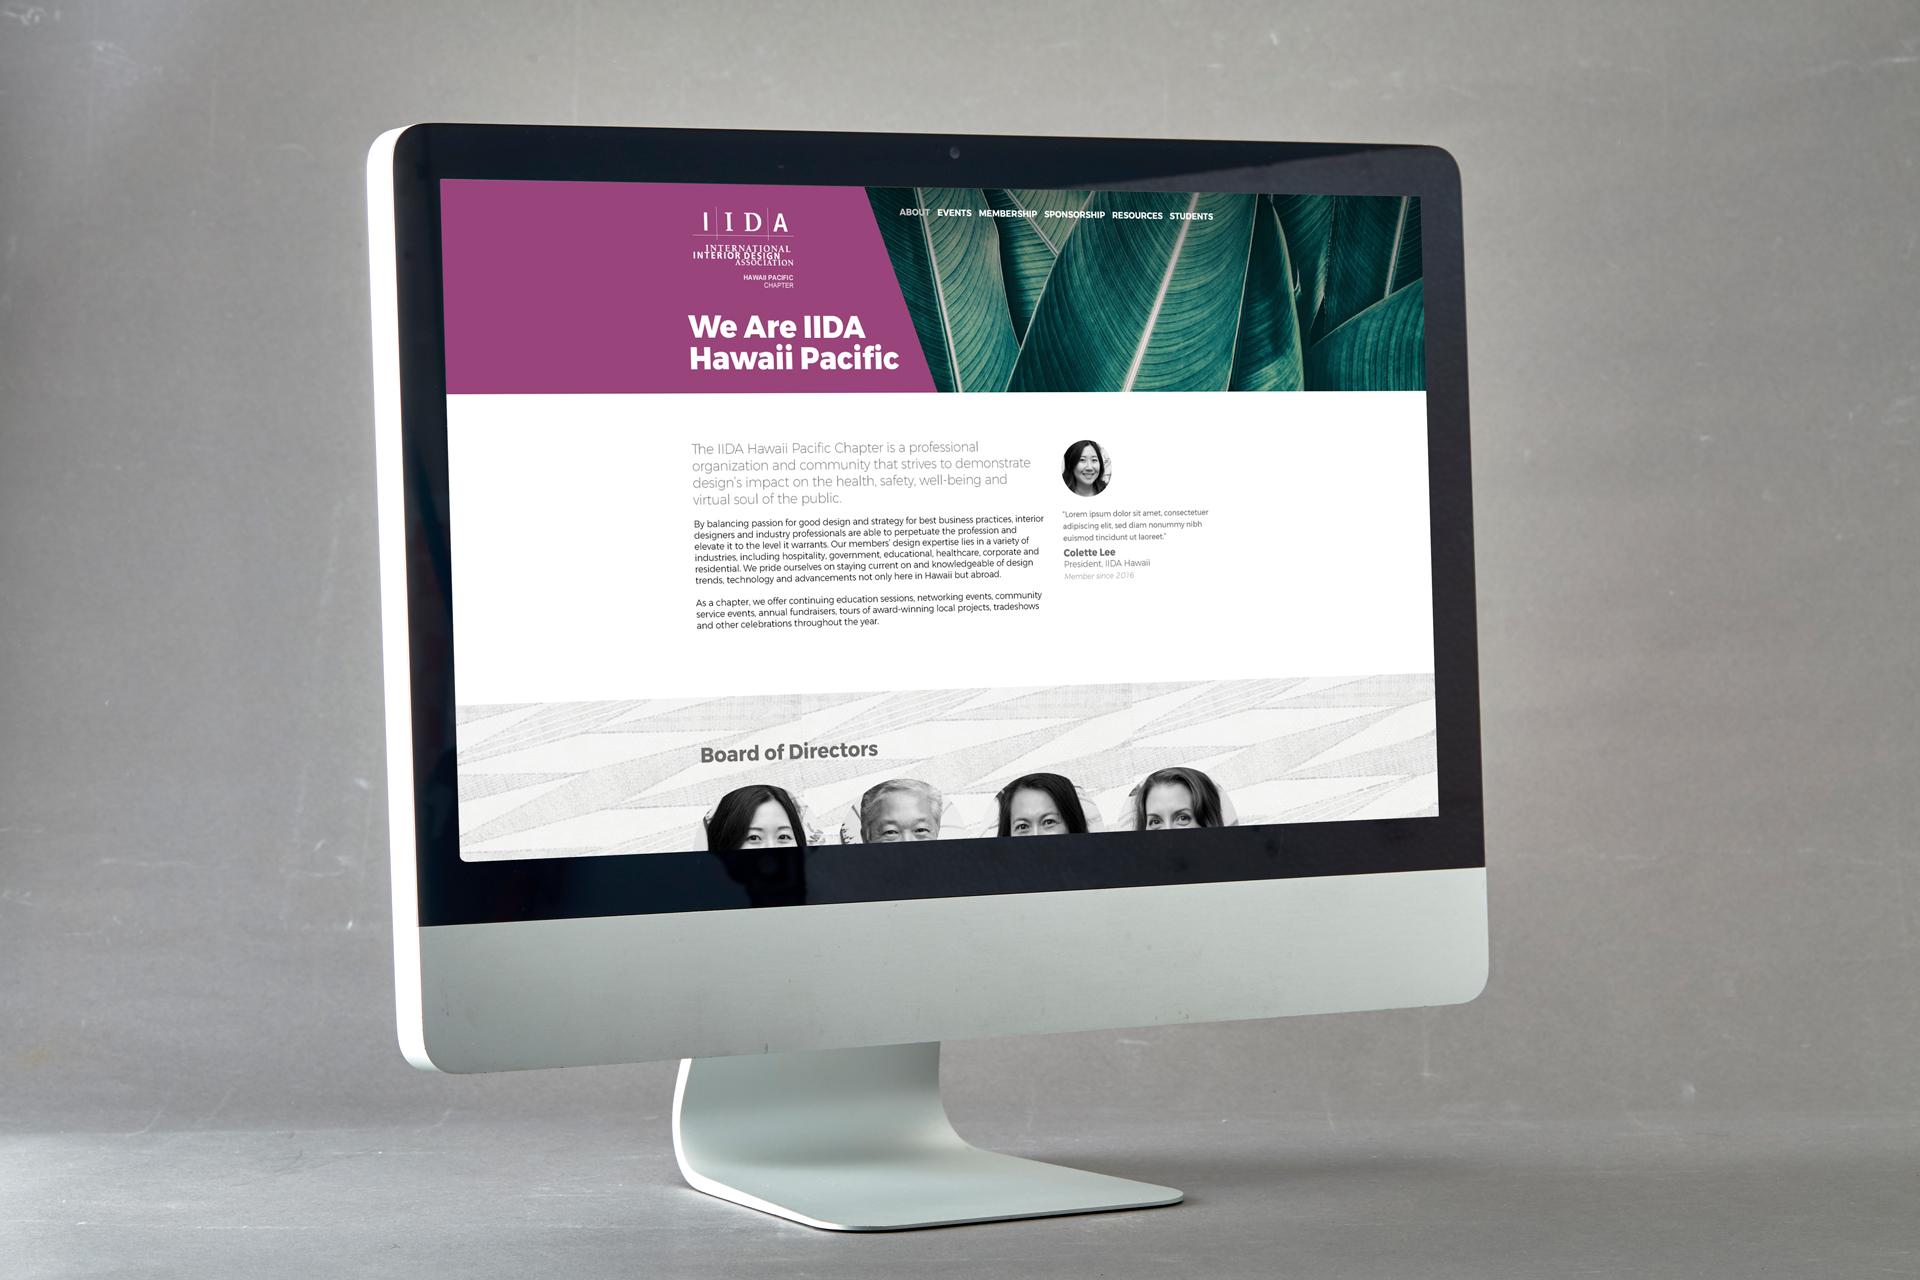 IIDAHPCwebsite3.jpg